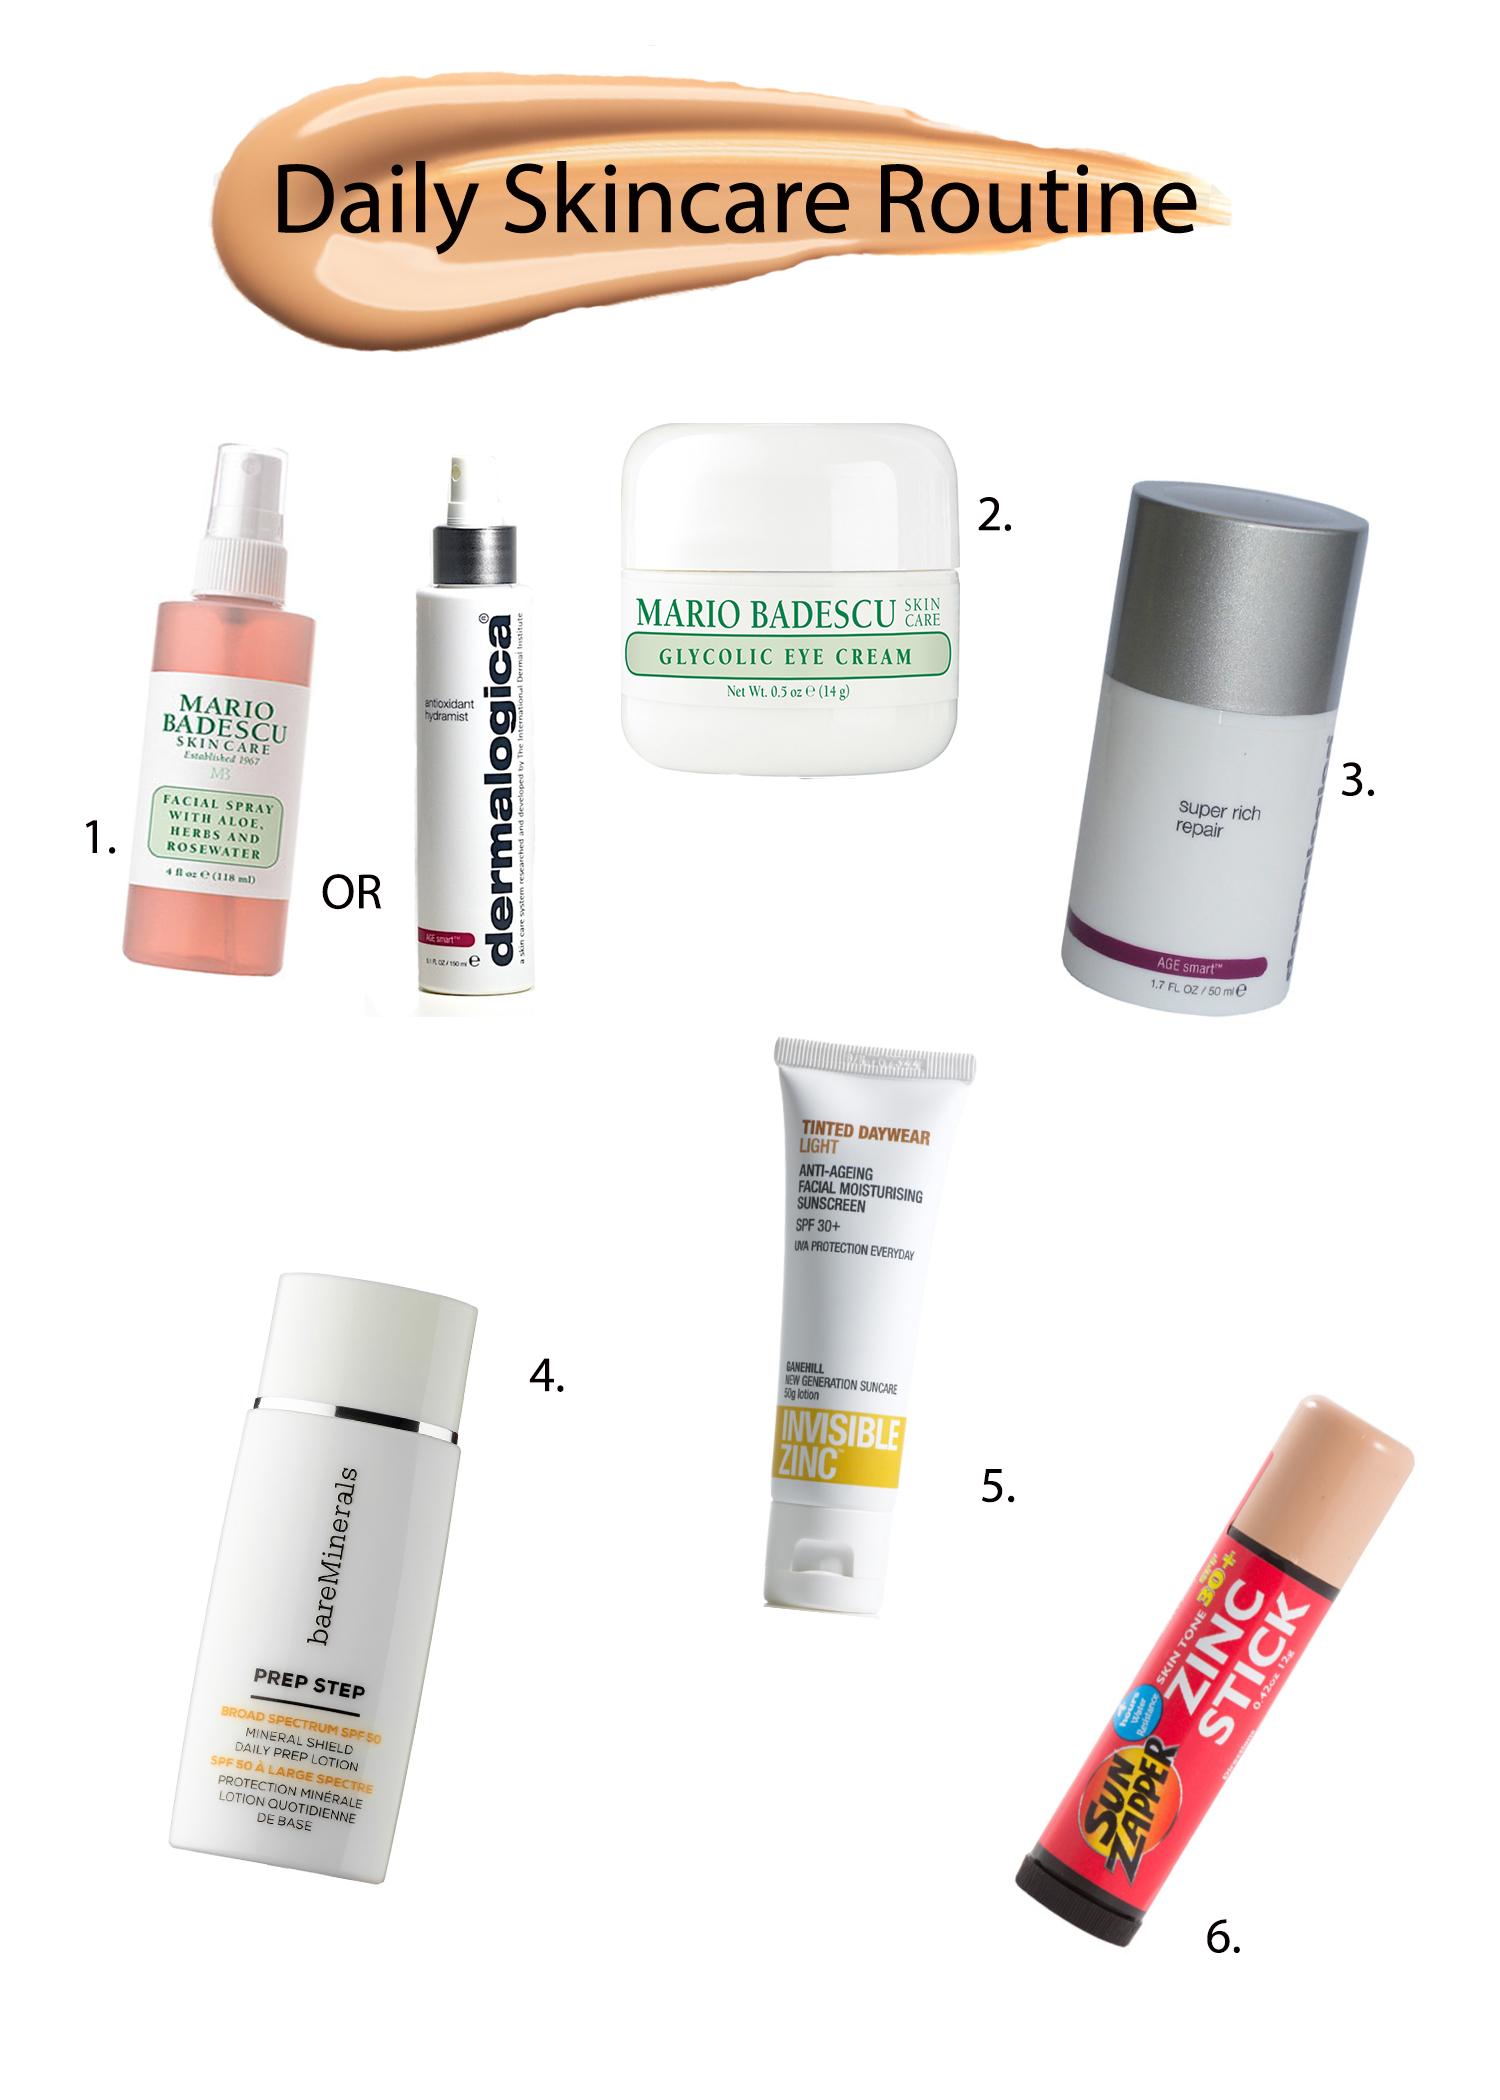 1. Mario Badescu Facial Spray or Dermalogica Hydramist toners; 2. Mario Badescu Glycol Eye Cream; 3.Dermalogica Super Rich; 4. Bare Minerals Prep Step sunblock; 5. Invisible Zinc sunscreen; 6. Sun Zapper Zinc Stick